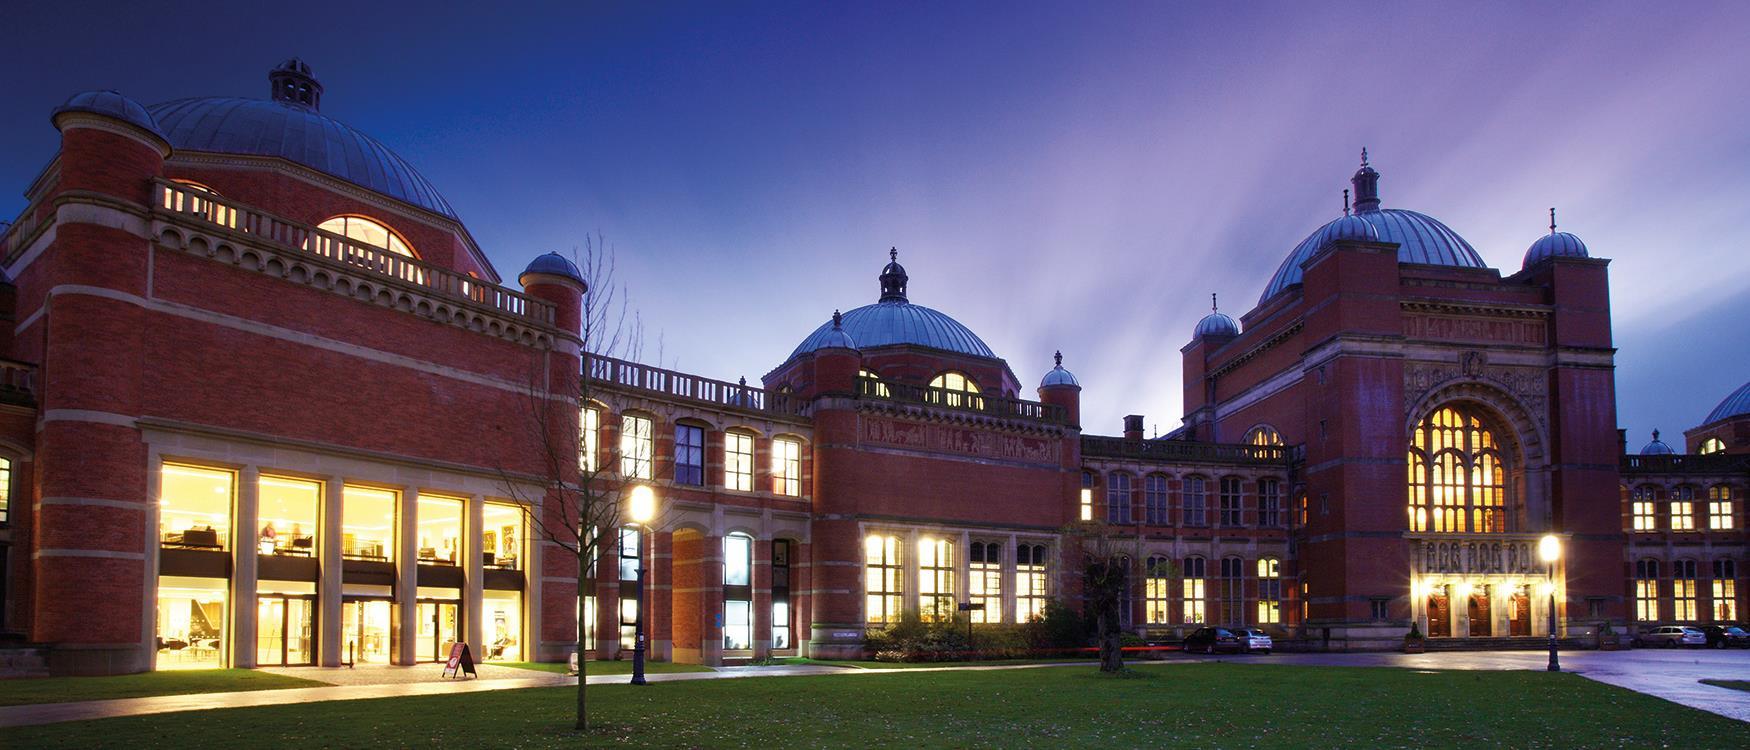 University of Birmingham, 20 - 23 June 2022